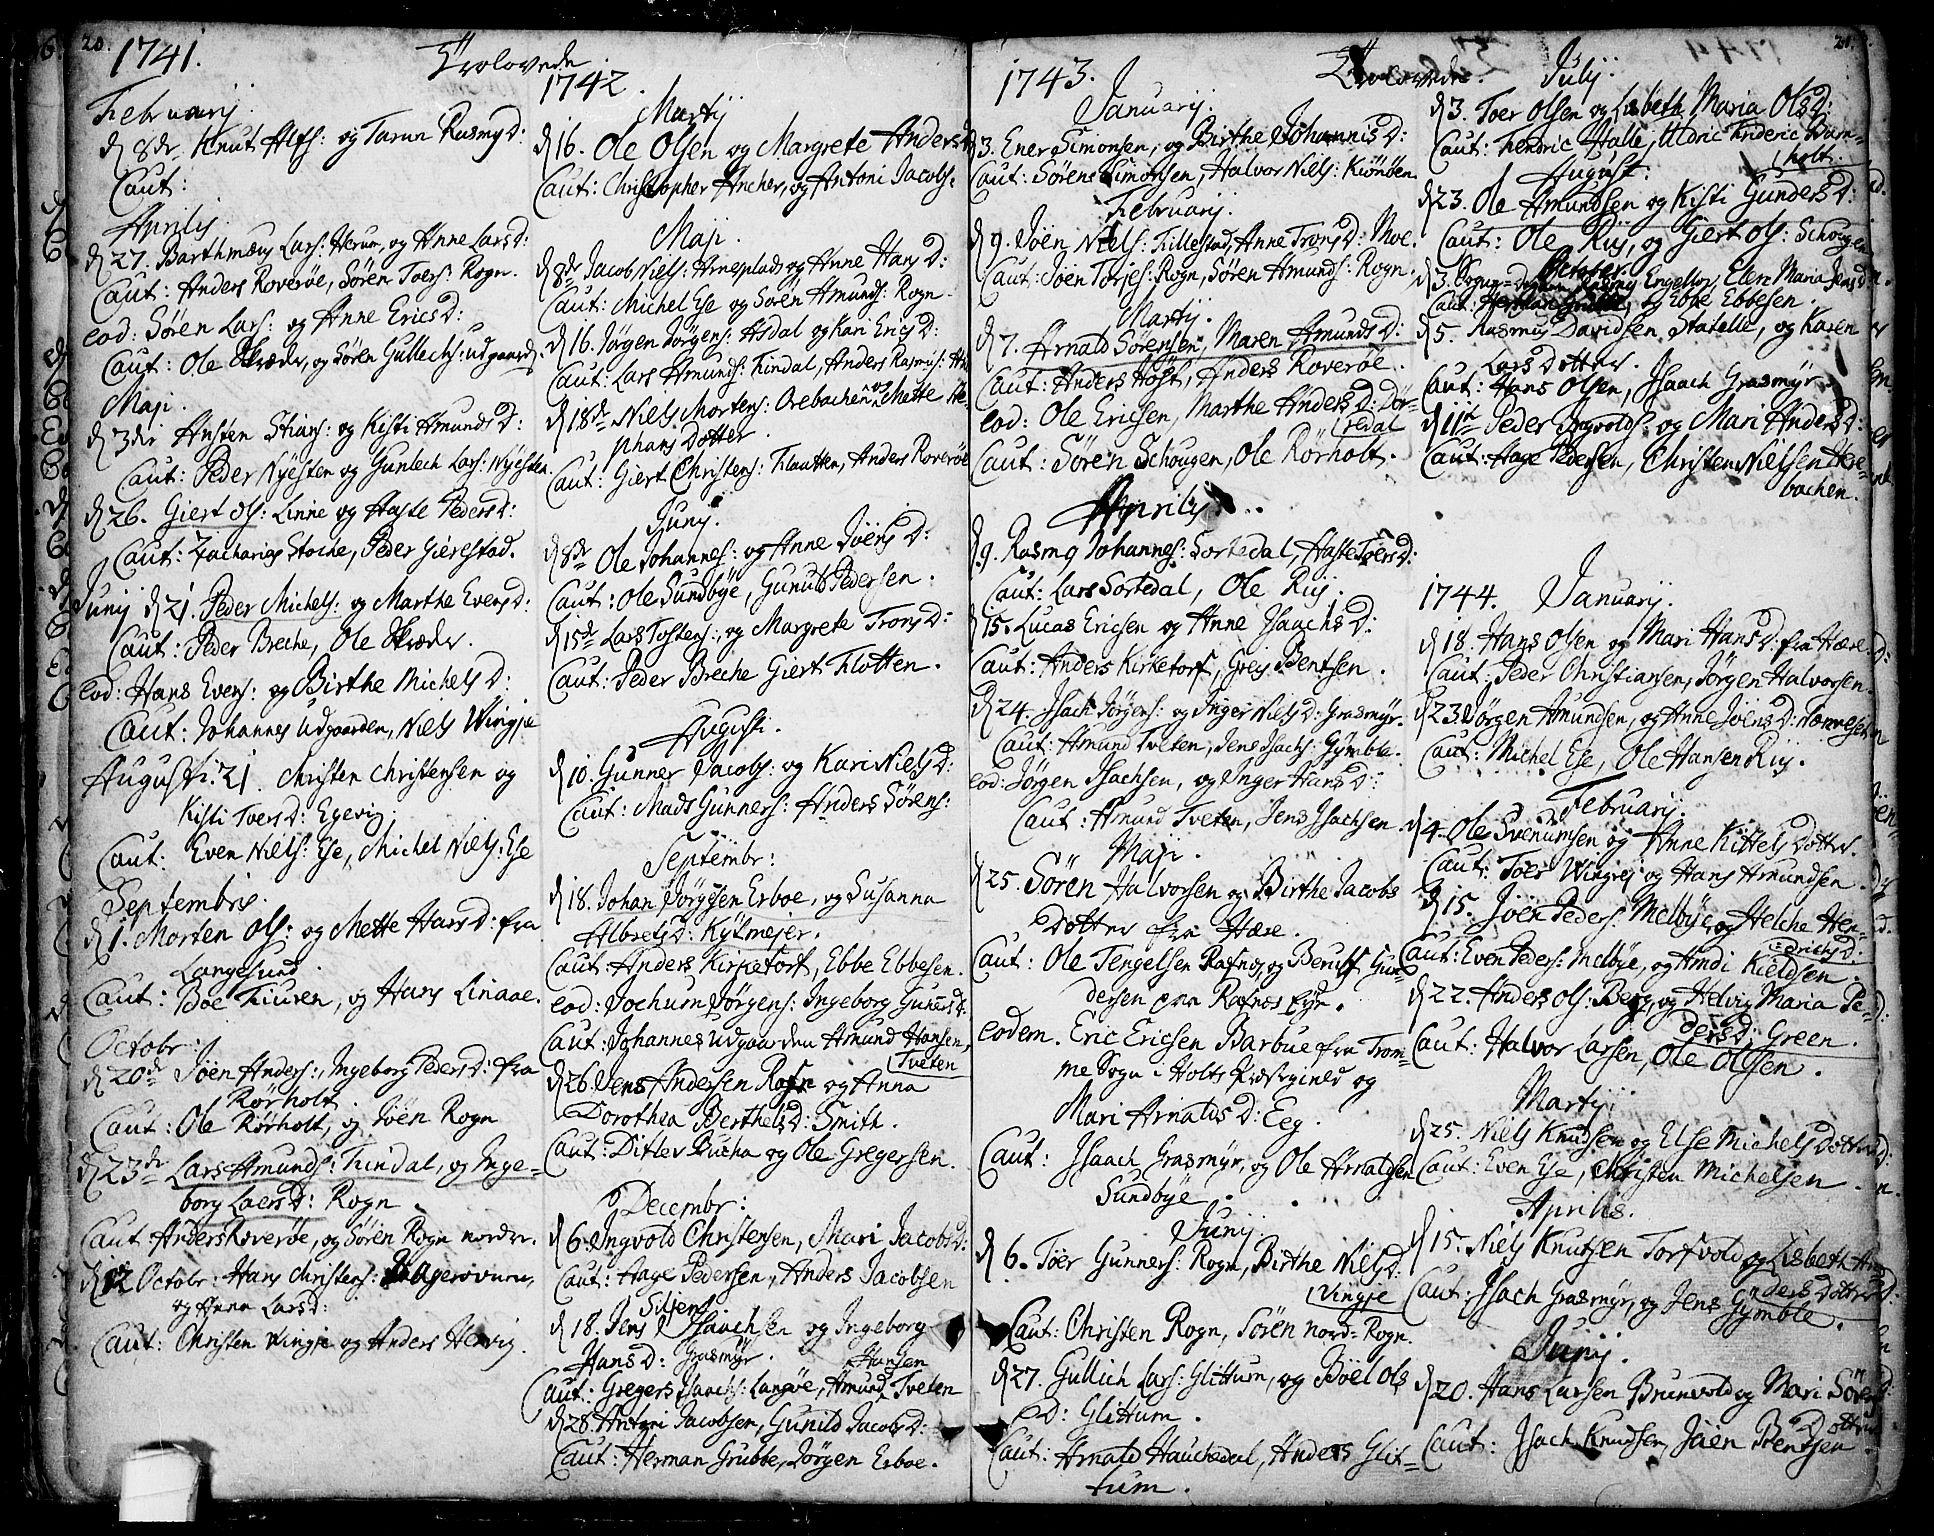 SAKO, Bamble kirkebøker, F/Fa/L0001: Ministerialbok nr. I 1, 1702-1774, s. 20-21